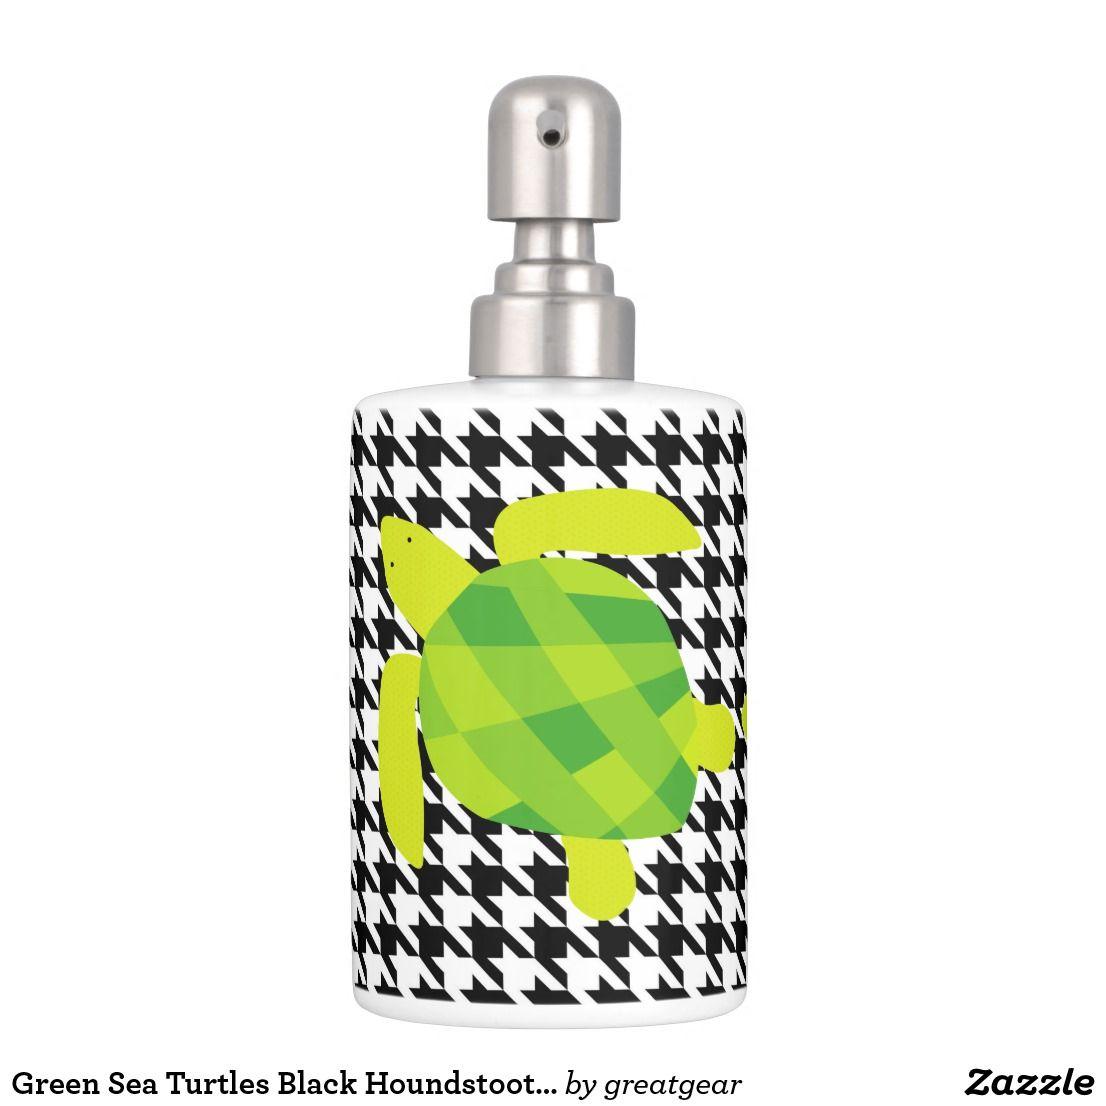 Green Sea Turtles Black Houndstooth Bathroom Set | Bath accessories ...